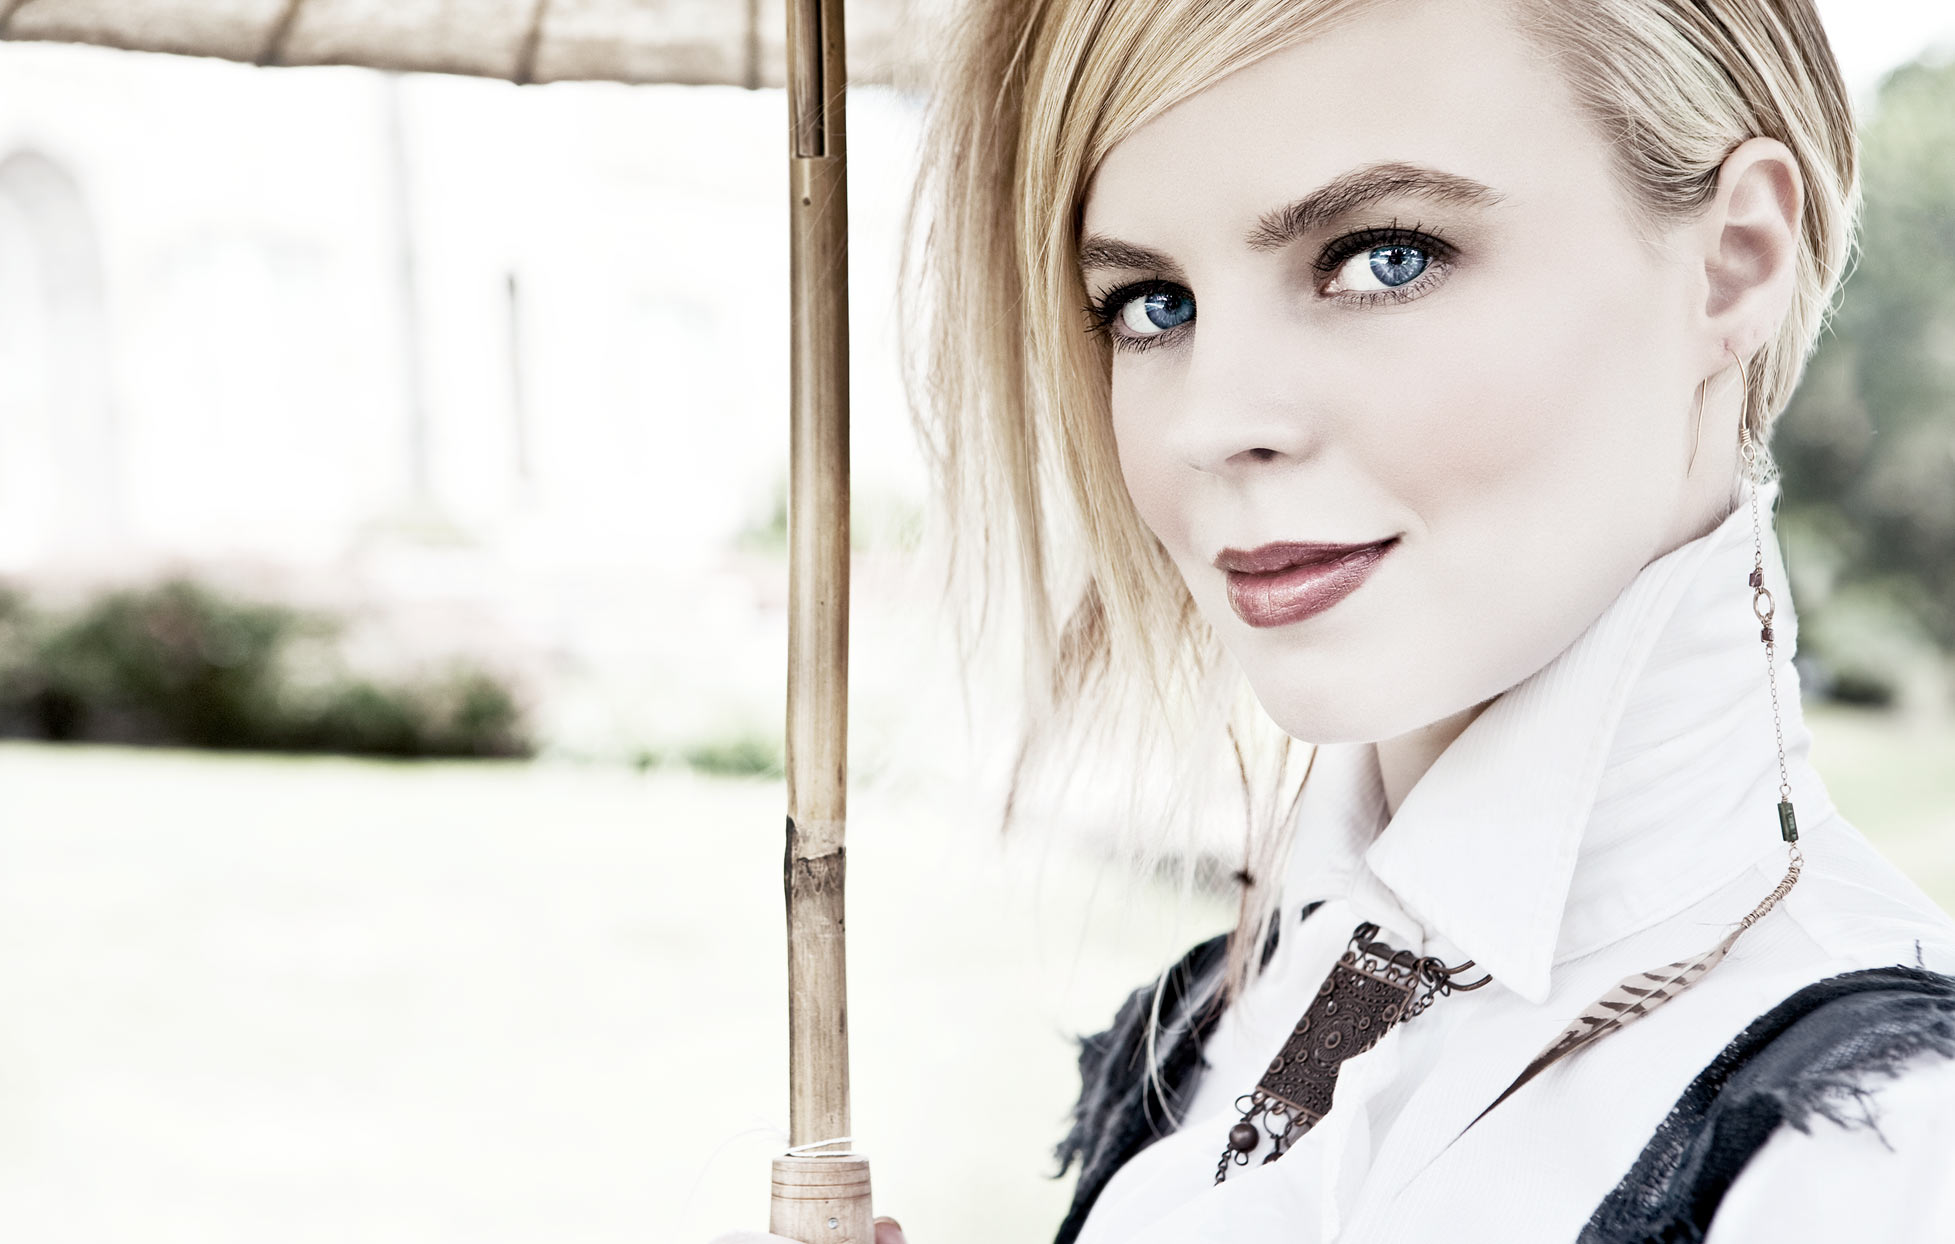 Mark DeLong - Celebrity Photographer - Blonde actress in fantasy clothing holding an umbrella.